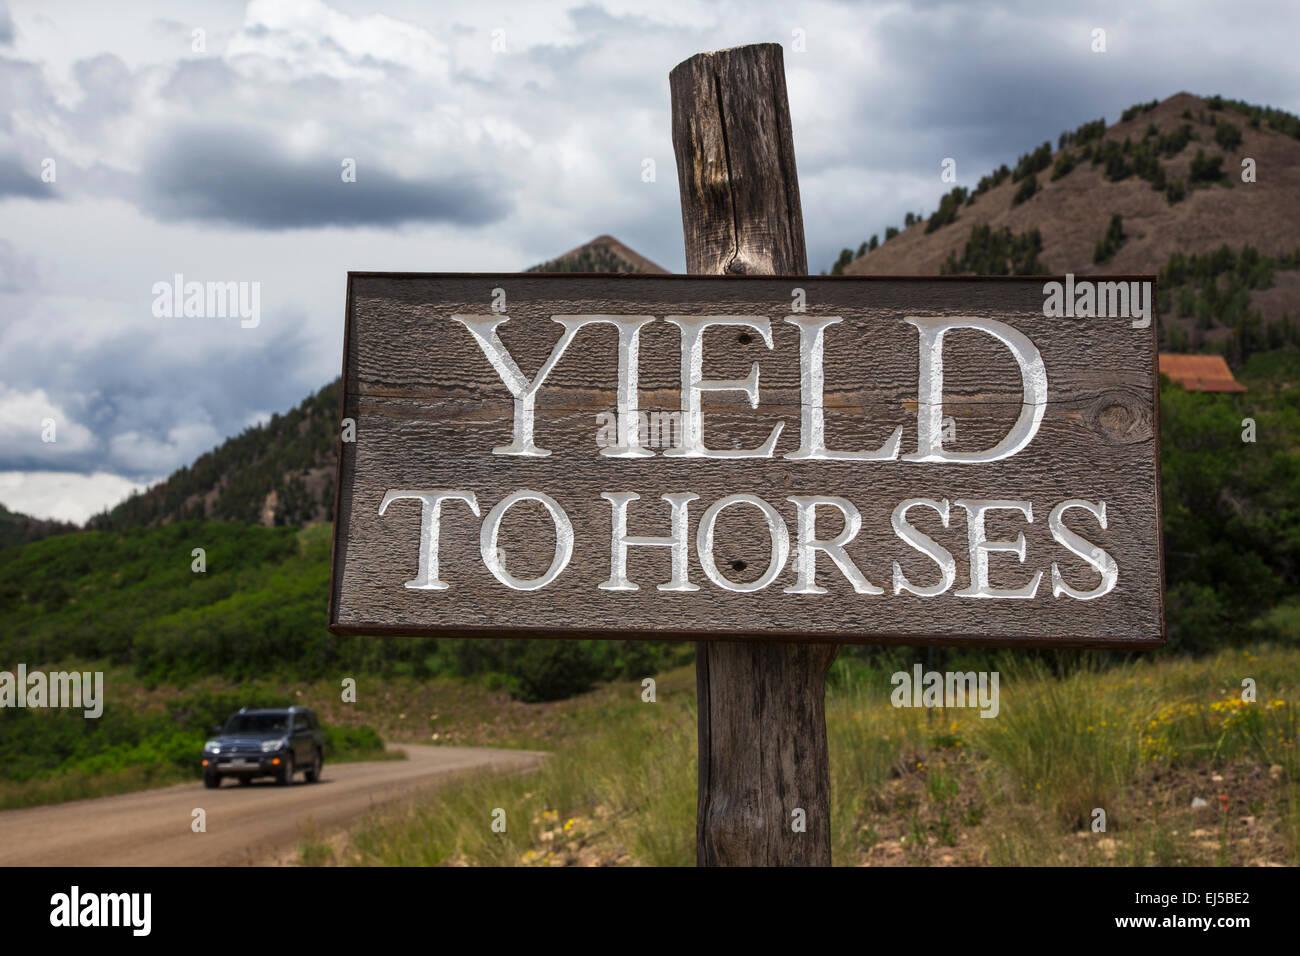 Road sign saying Yield to Horses, Colorado, USA - Stock Image